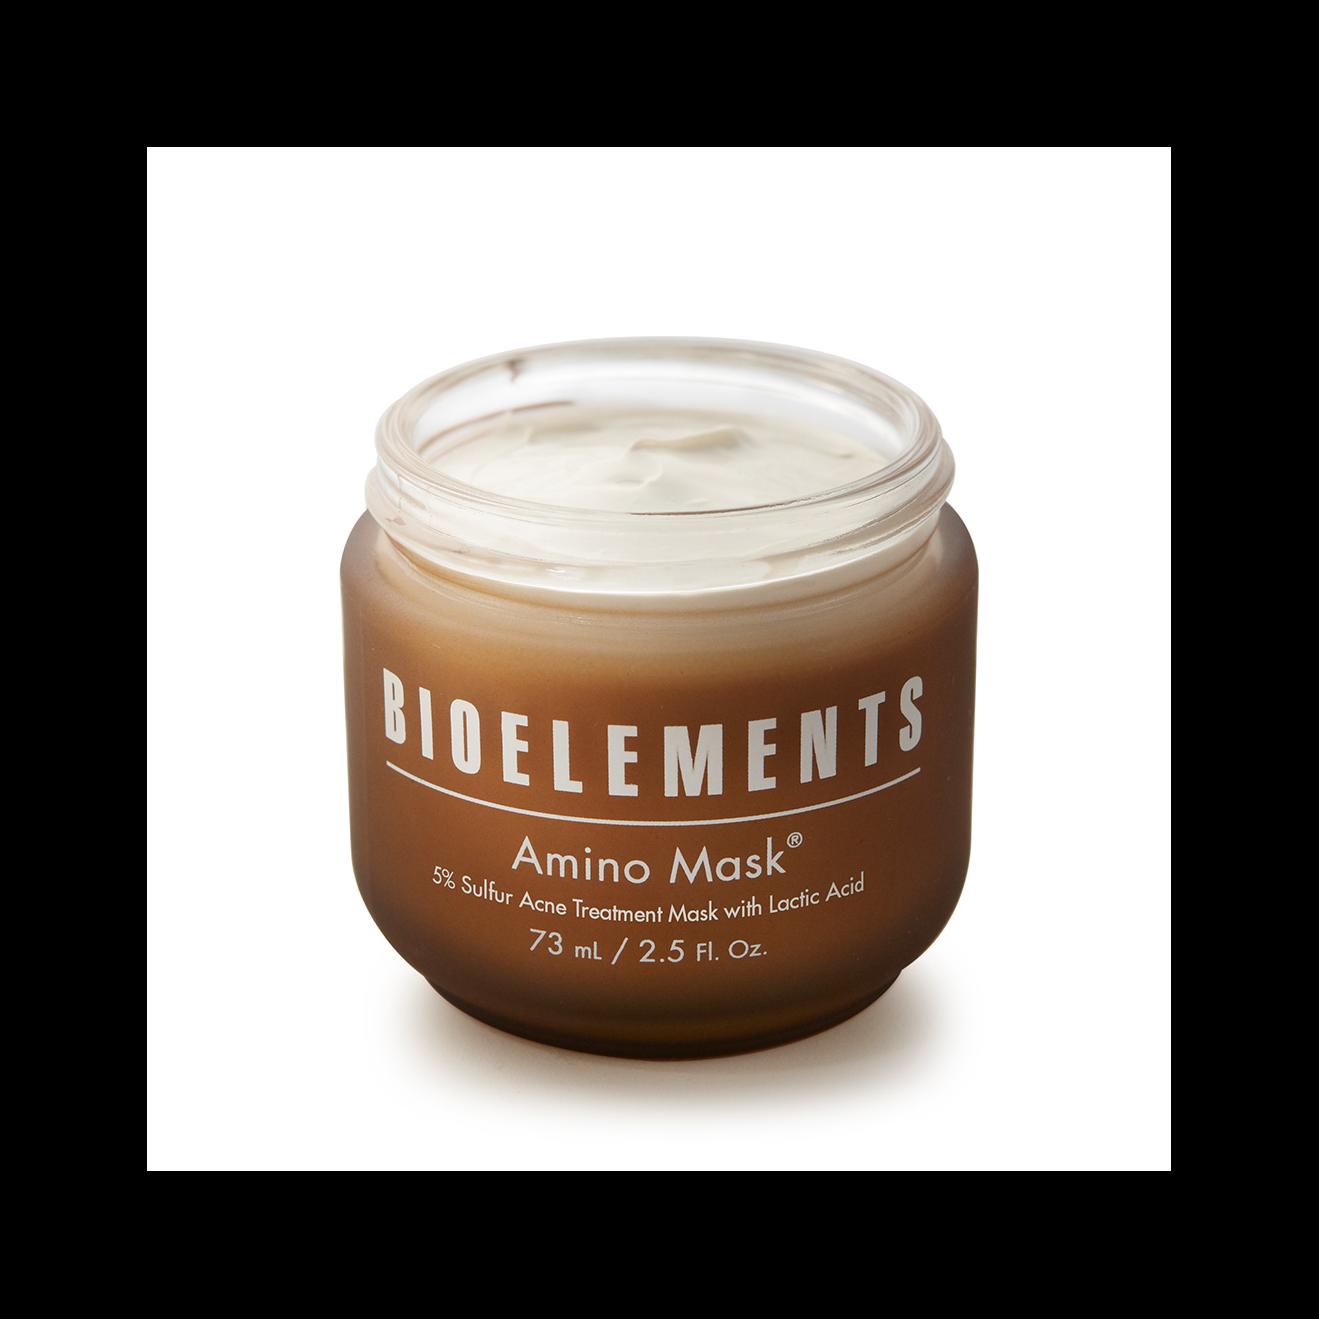 Bioelements Amino Mask for Acne